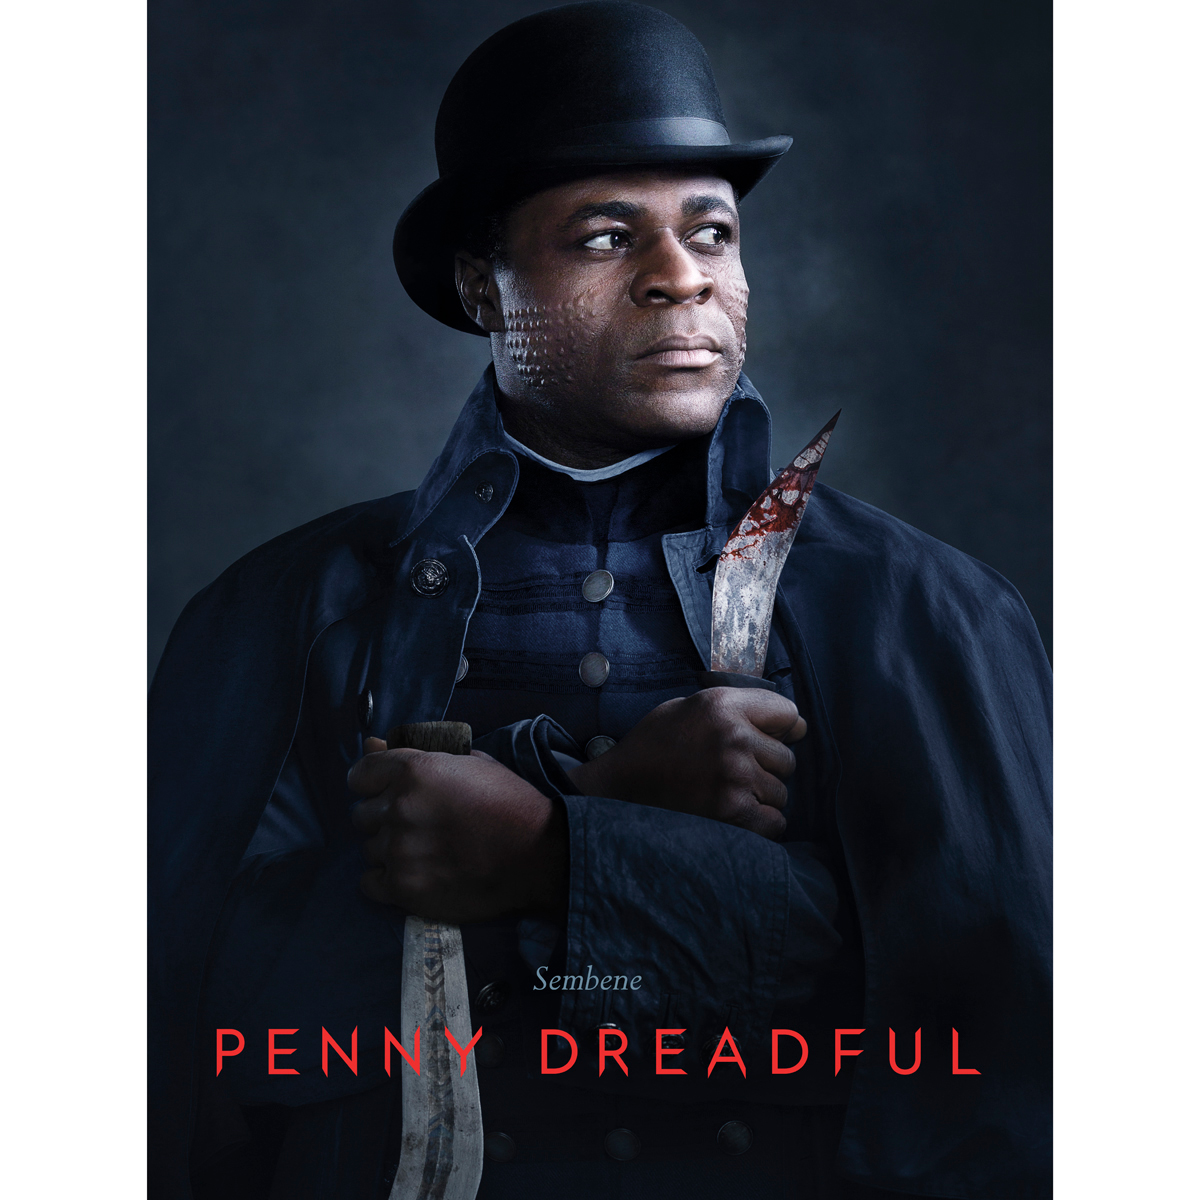 Penny Dreadful Sembene Giclee Print [18x24]